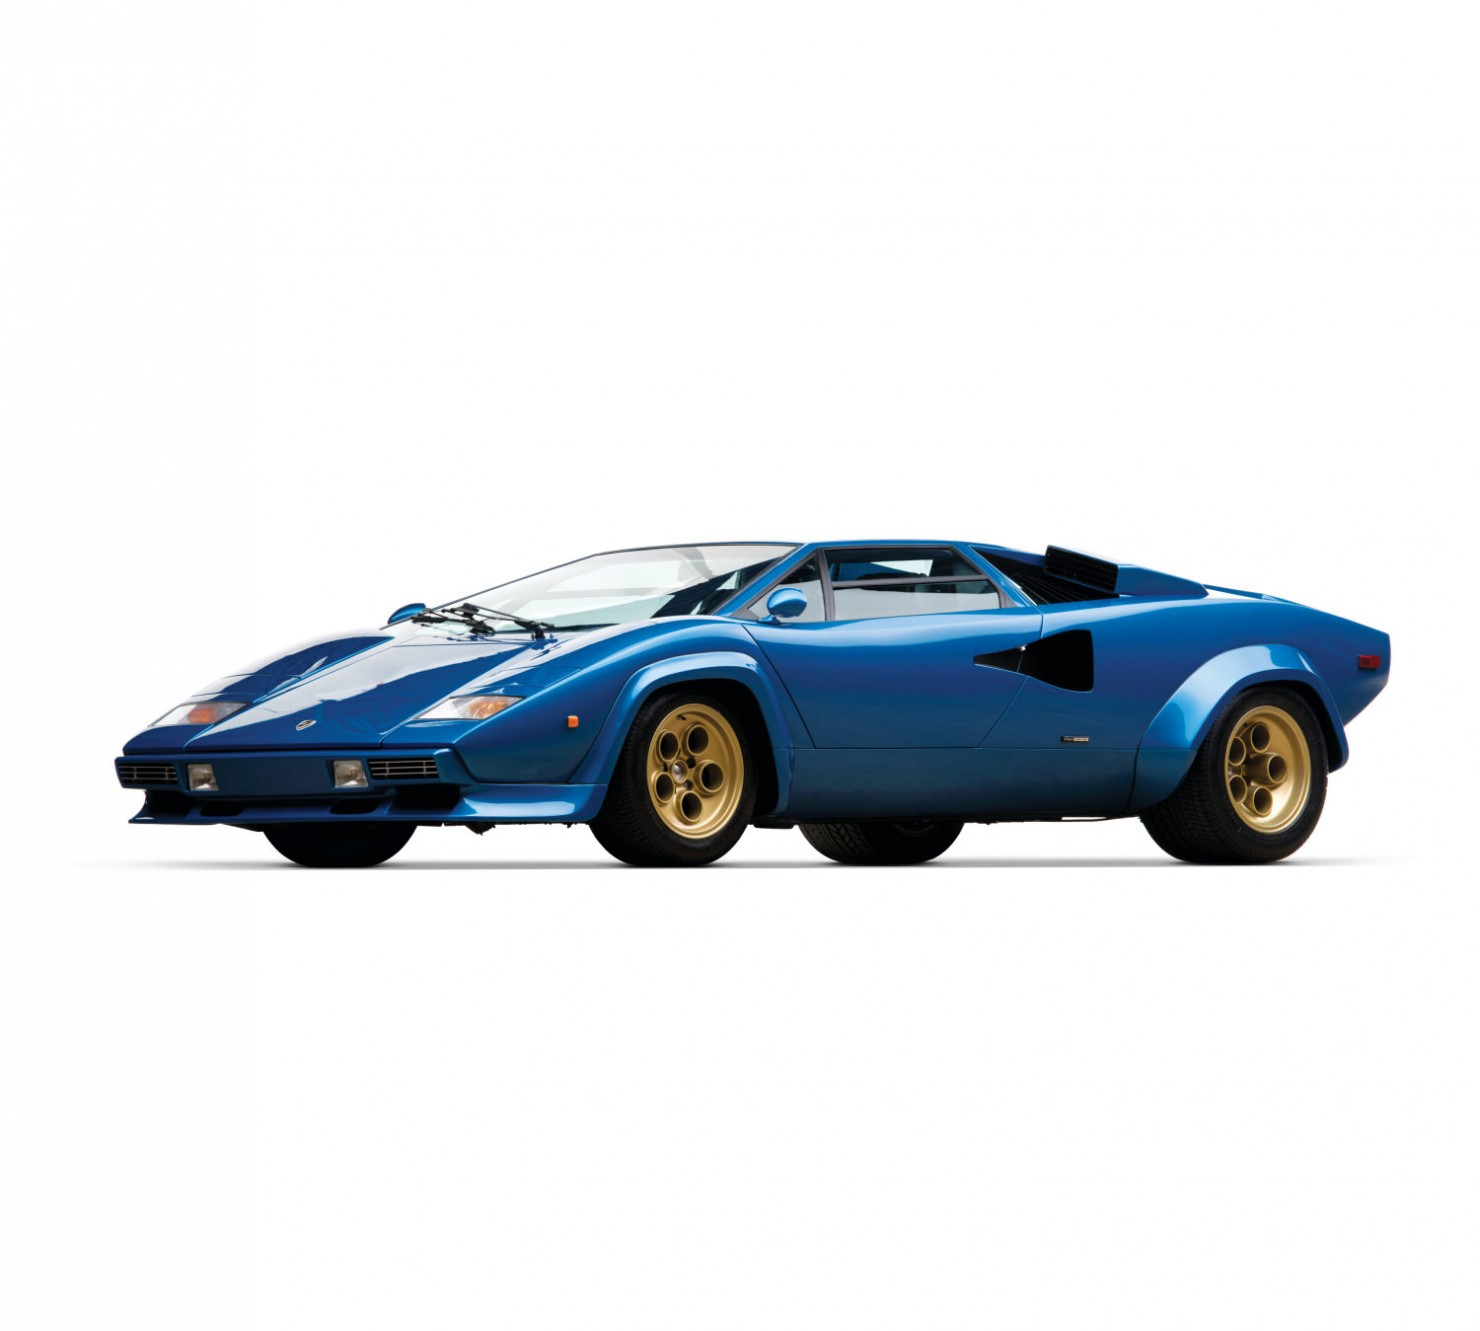 Lamborghini-Countach-LP400S